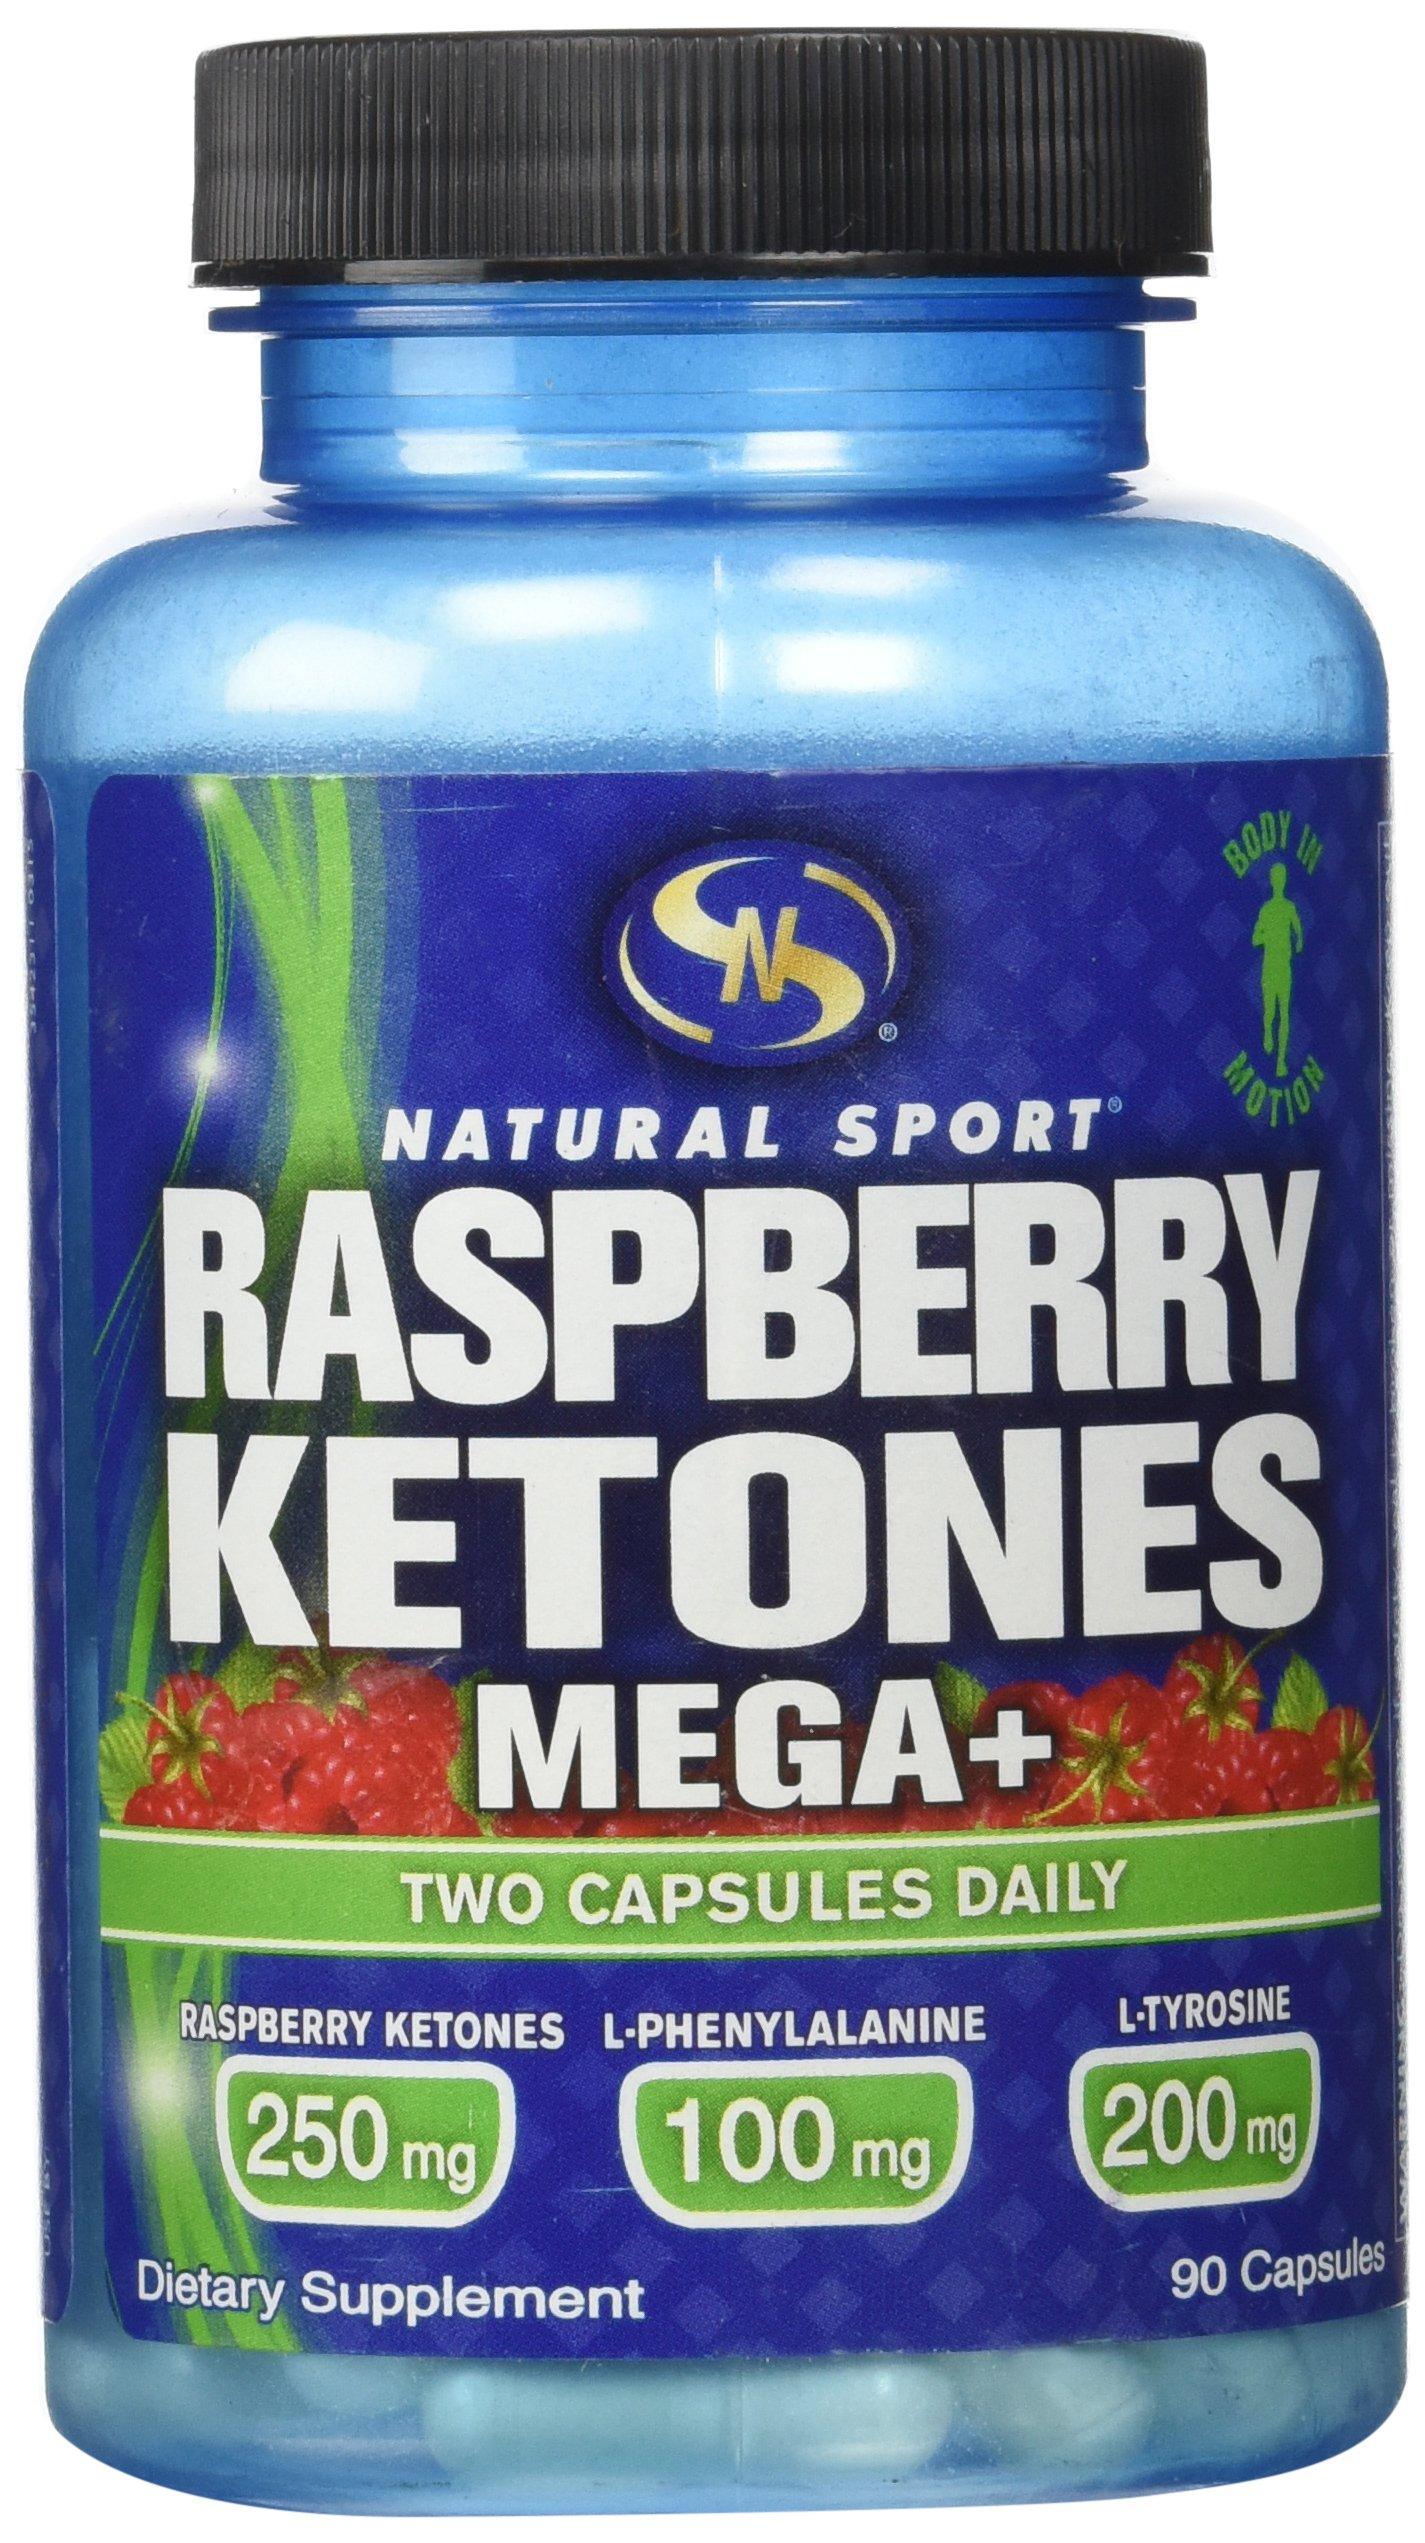 Raspberry Ketones Mega + 90 Capsule